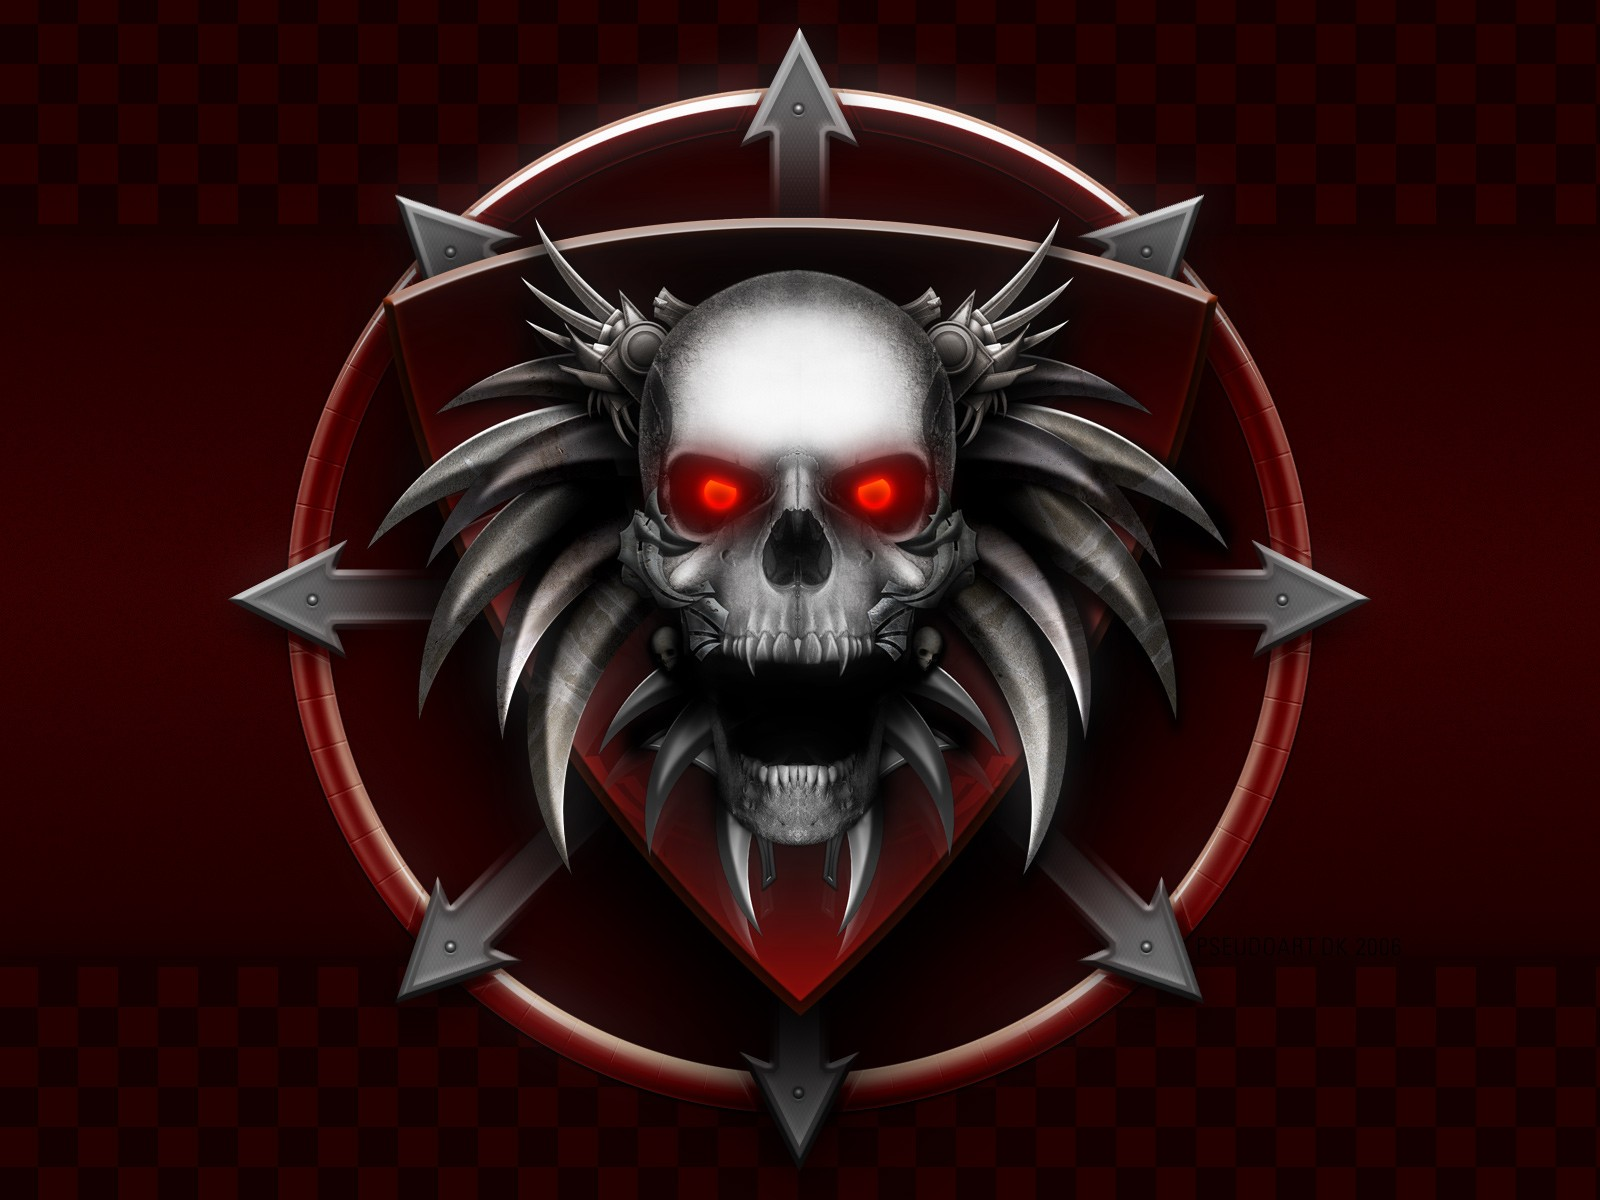 Dark horror skull occult evil demon wallpaper 1600x1200 29082 1600x1200